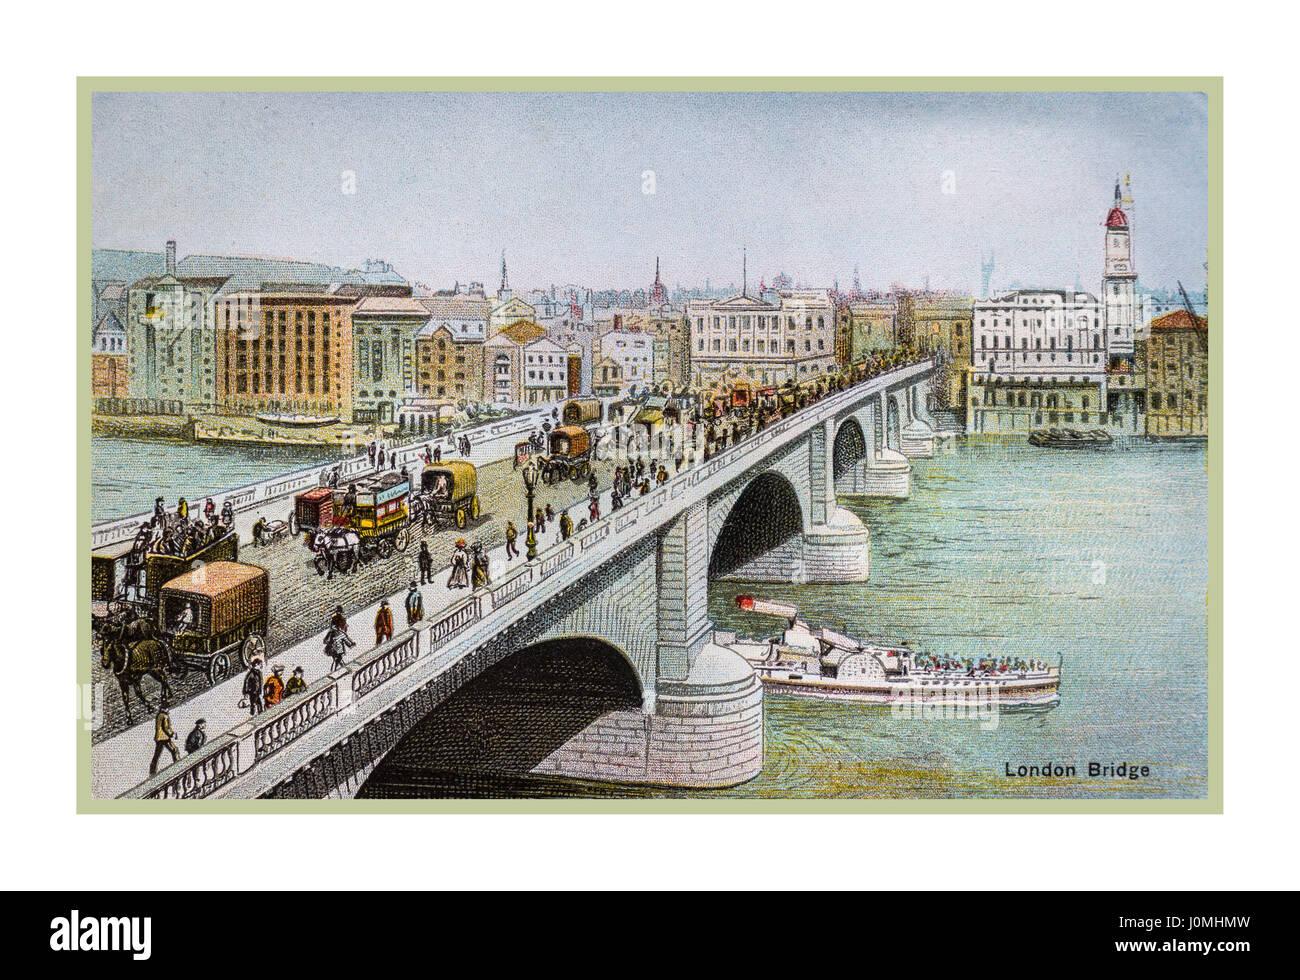 VINTAGE LONDON 1890's/1900's historic colour postcard illustration of London Bridge with horse drawn carriages - Stock Image